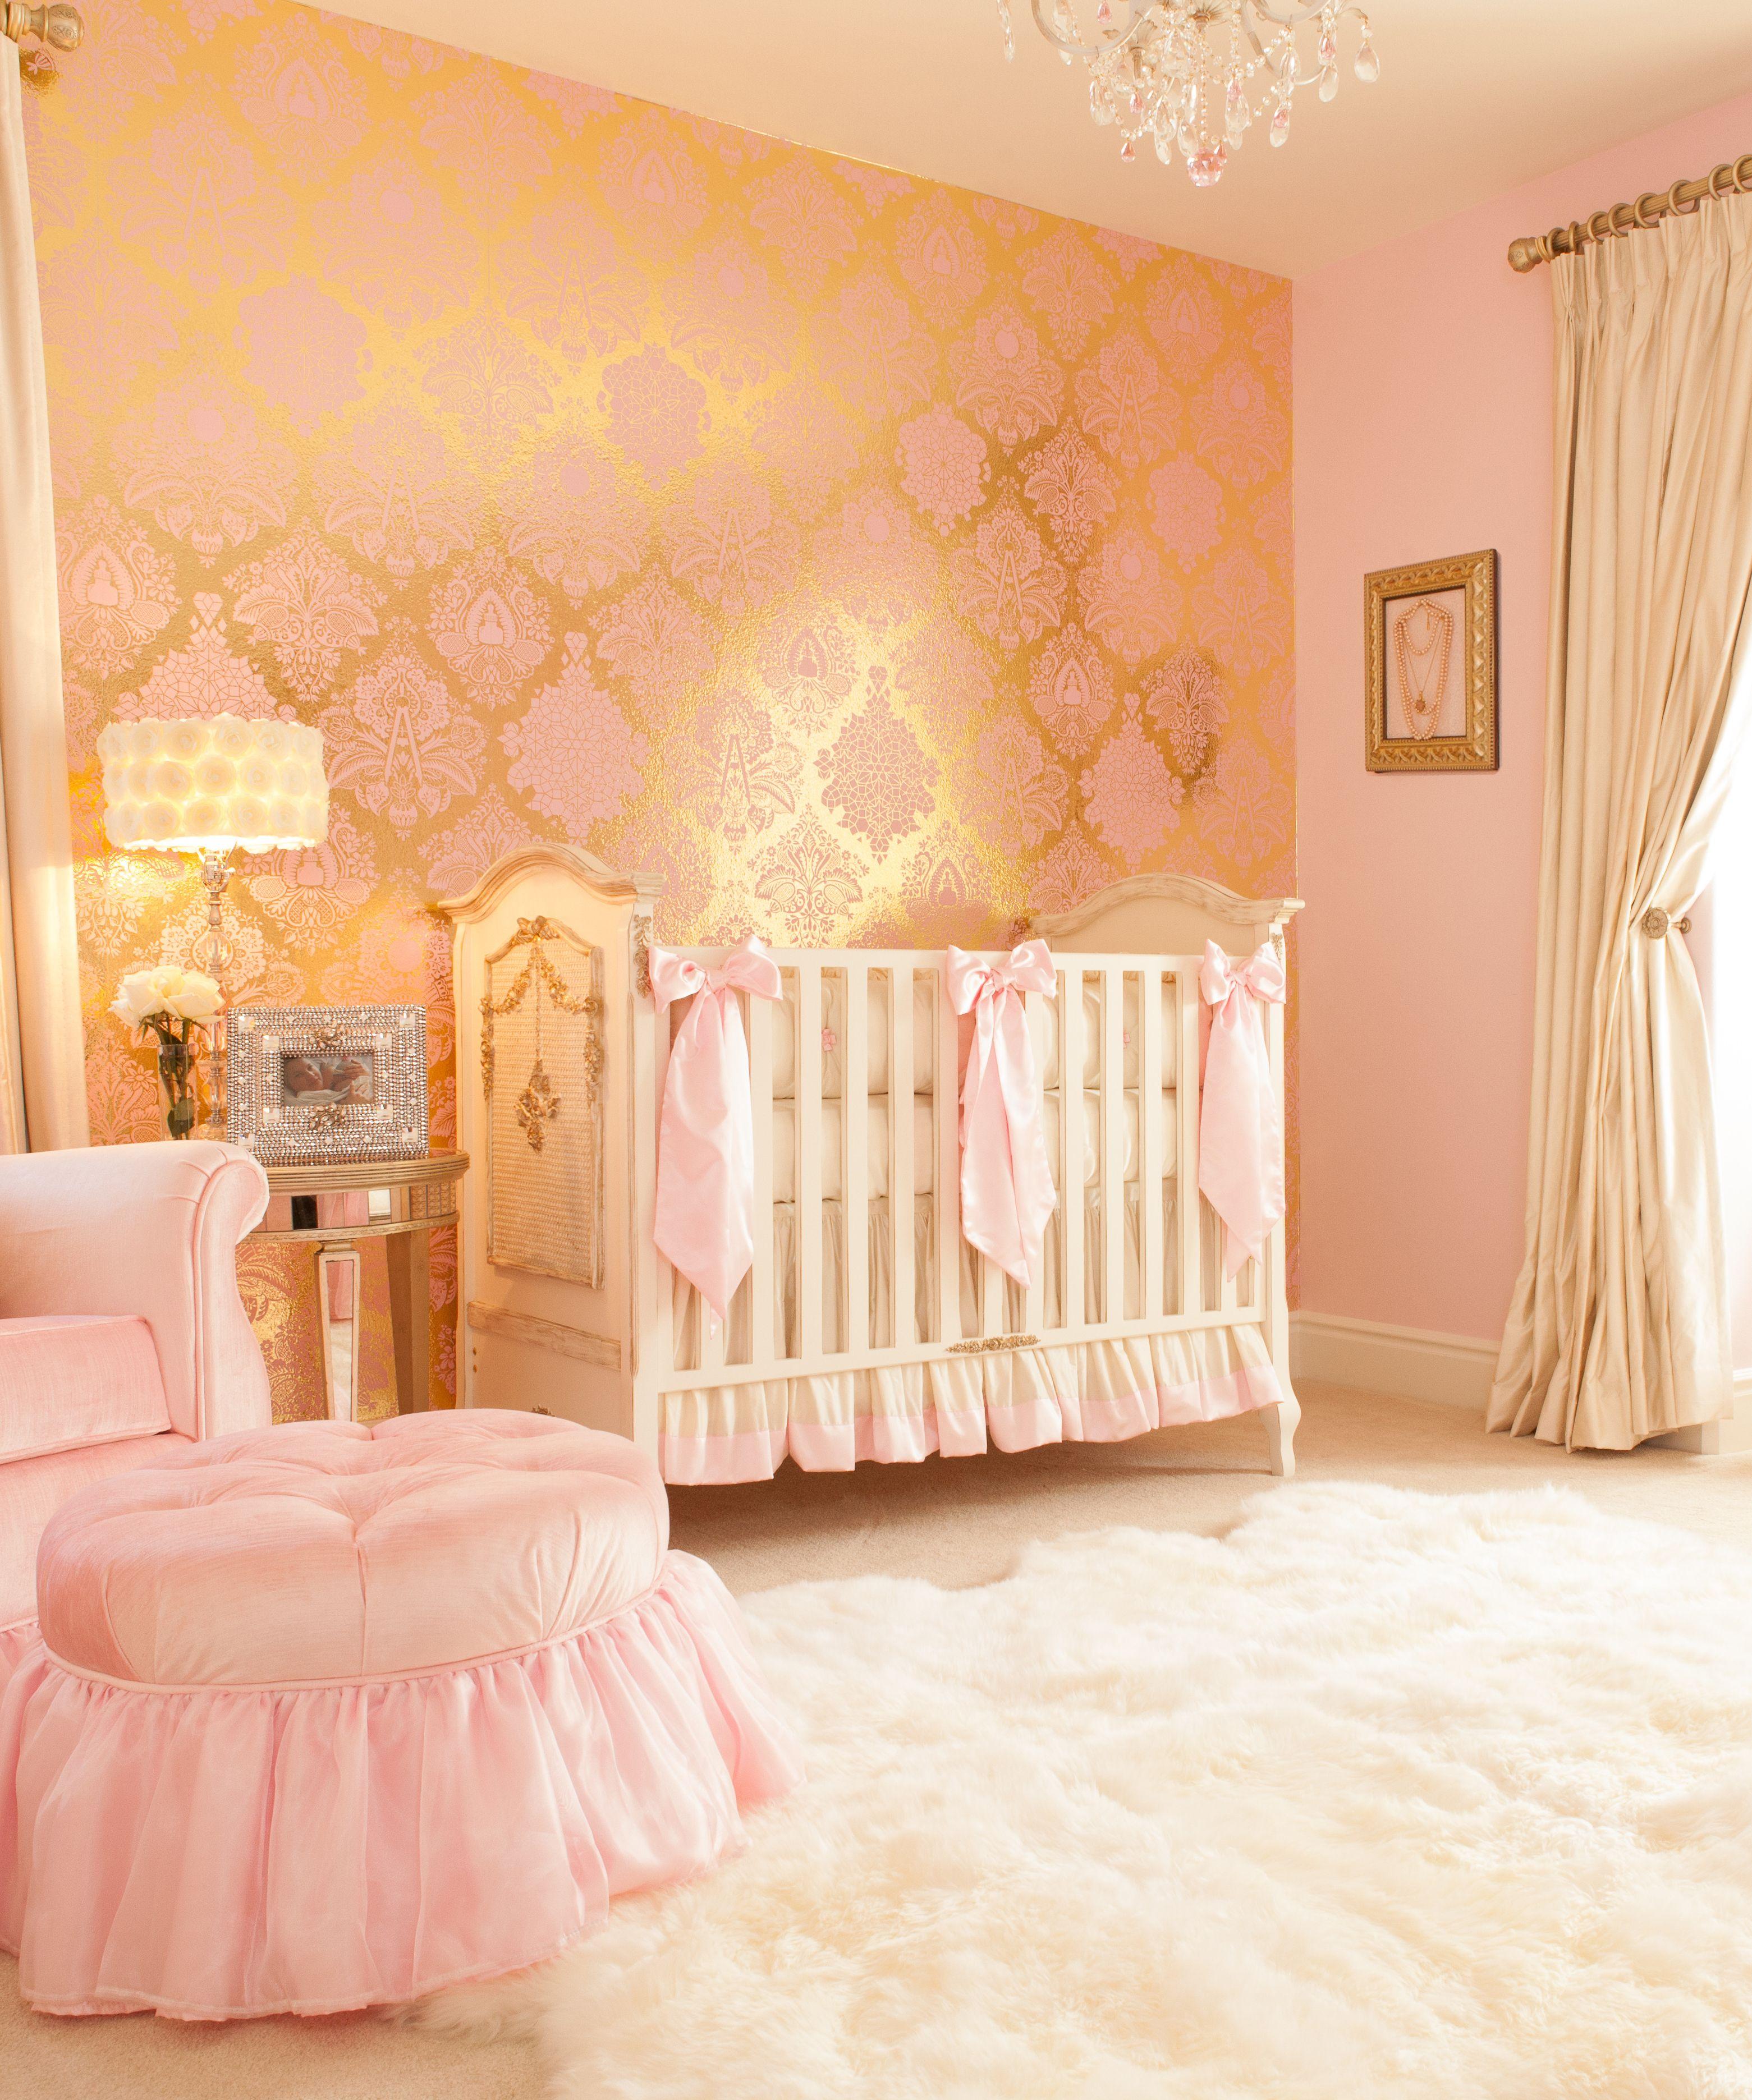 Angel Themed Design For A Baby Girl S Nursery: Fruits Of Design Damask Wallpaper